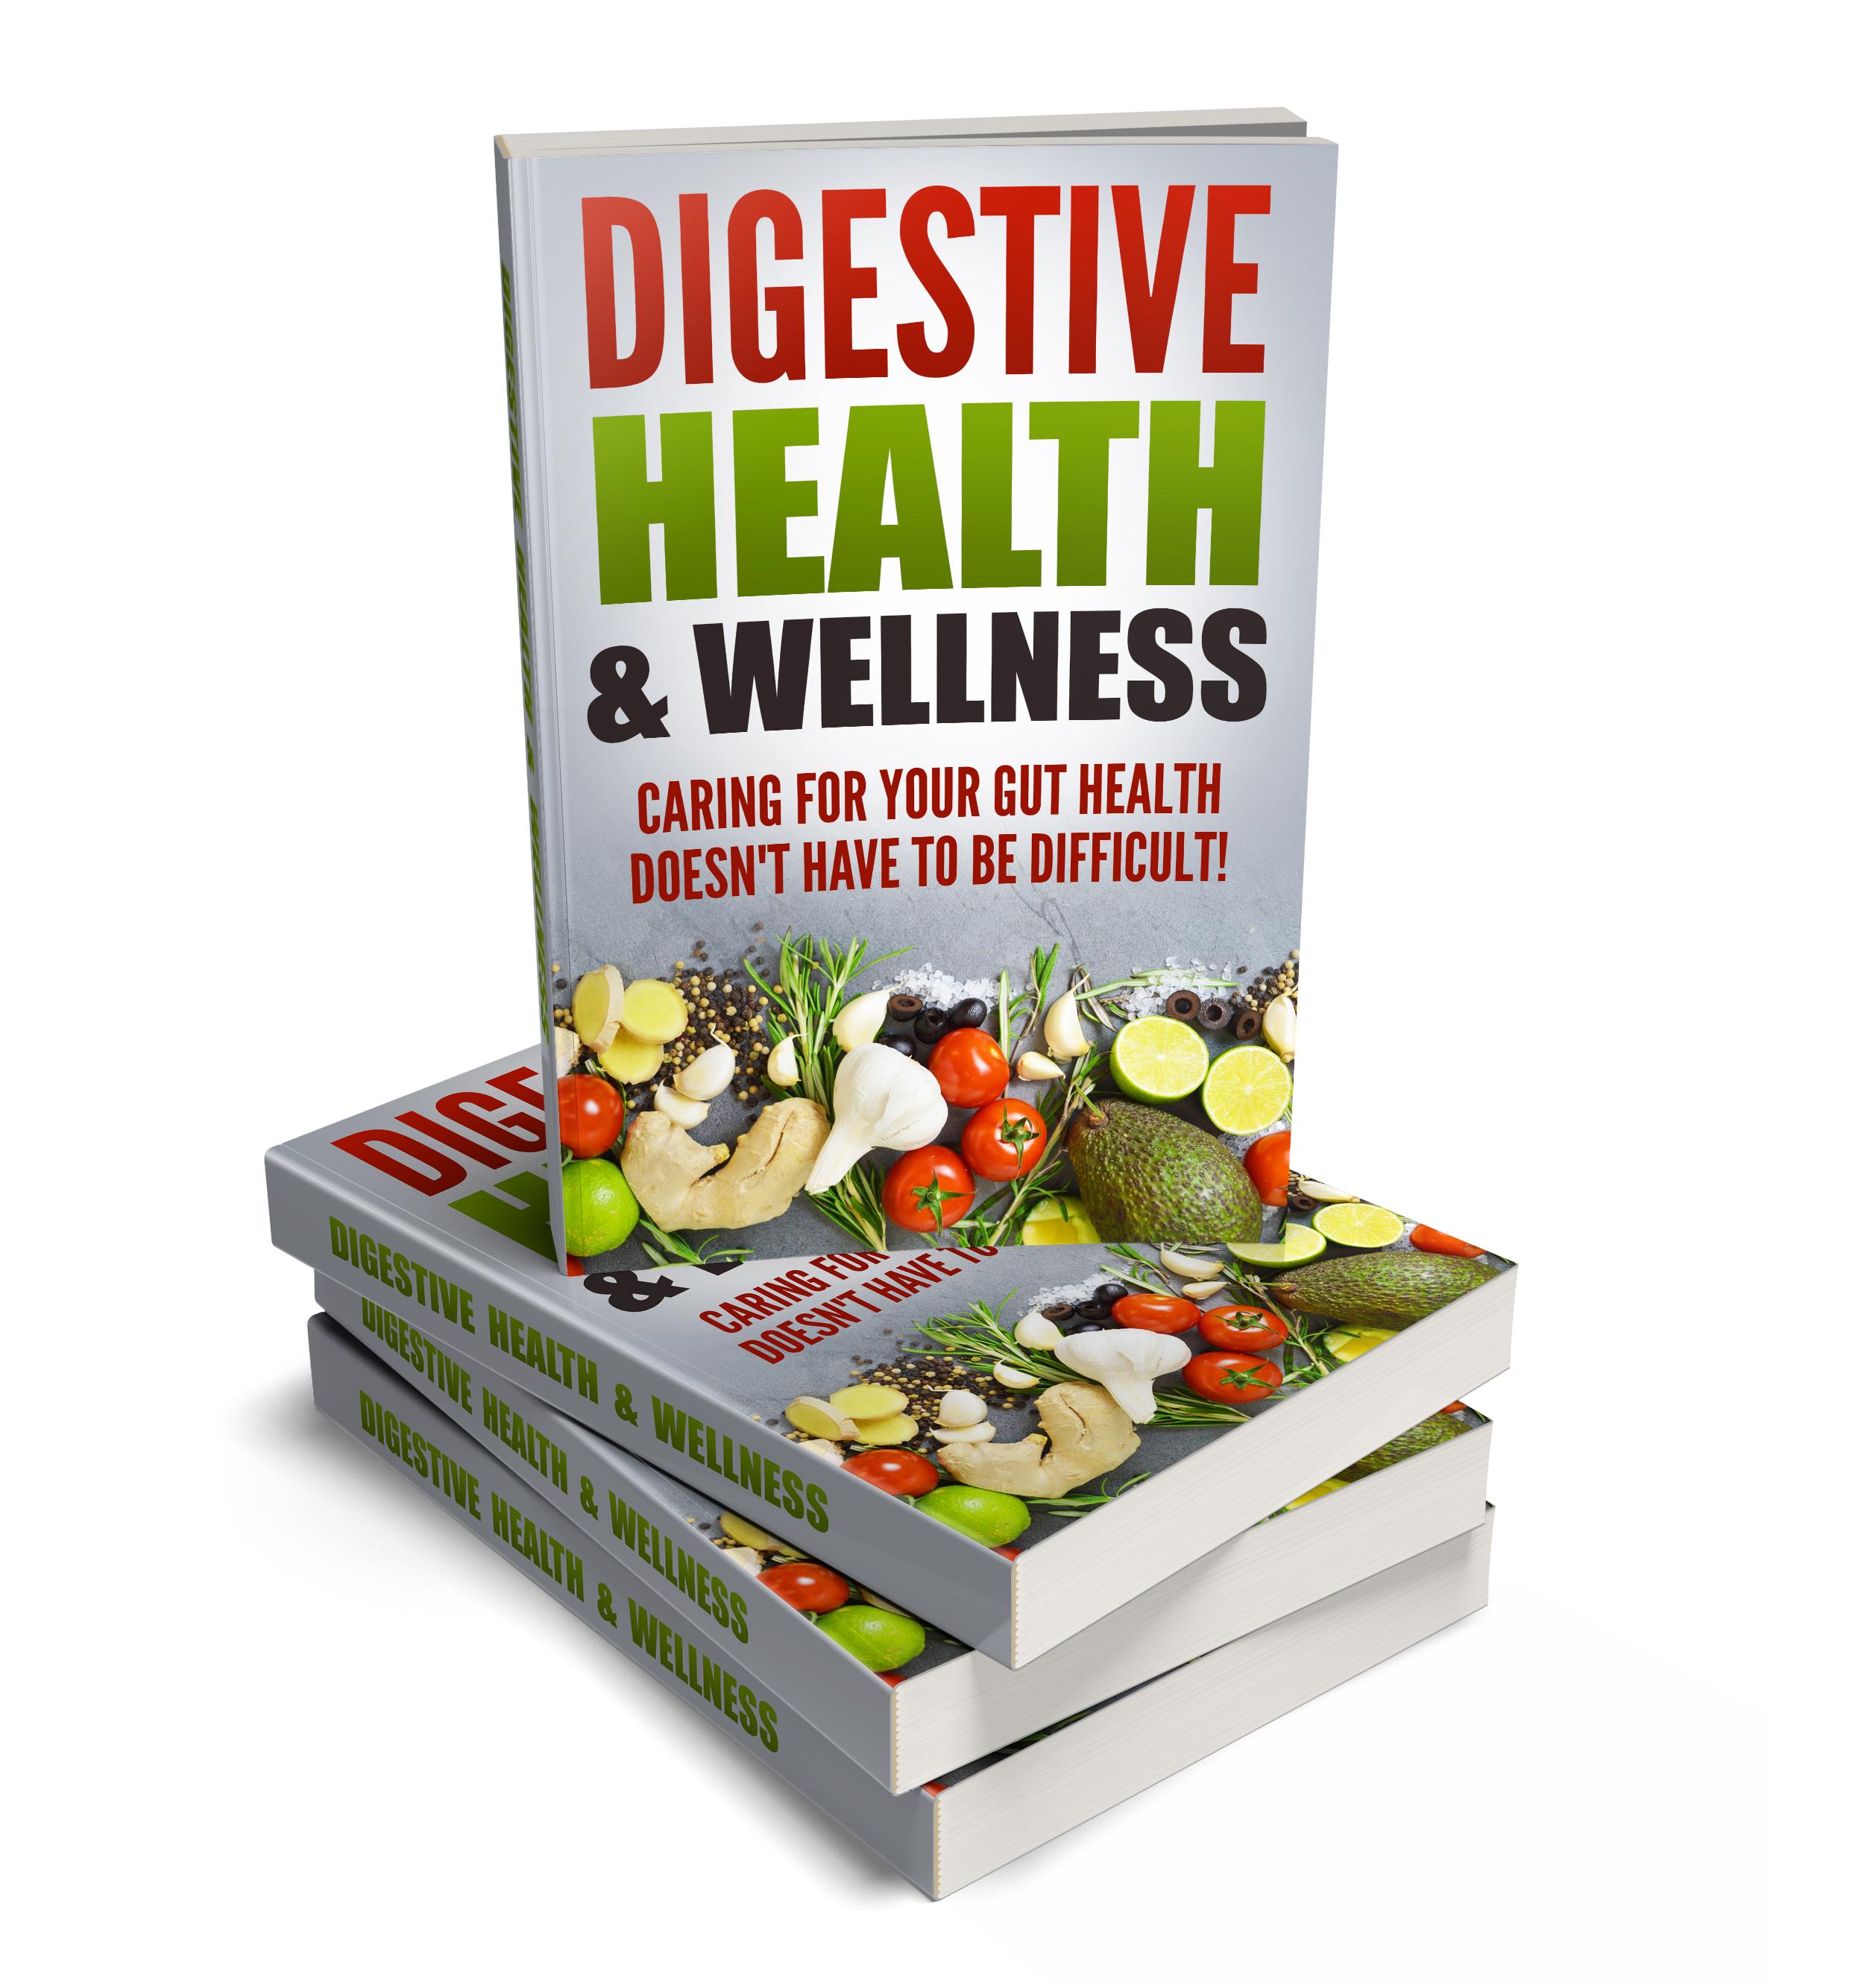 Digestive Health & Wellness